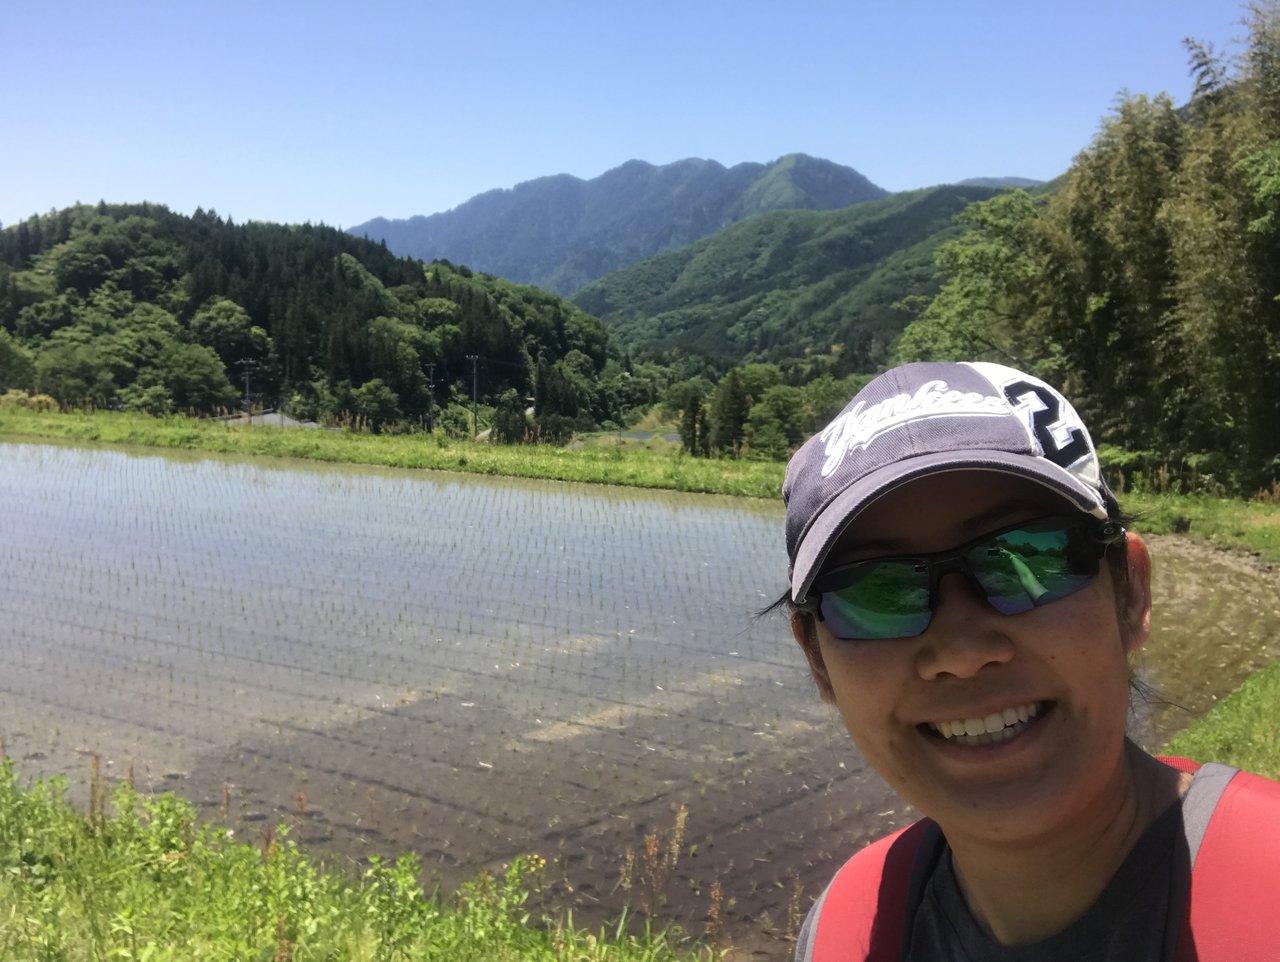 Rice fields | Photo taken by Pui san C